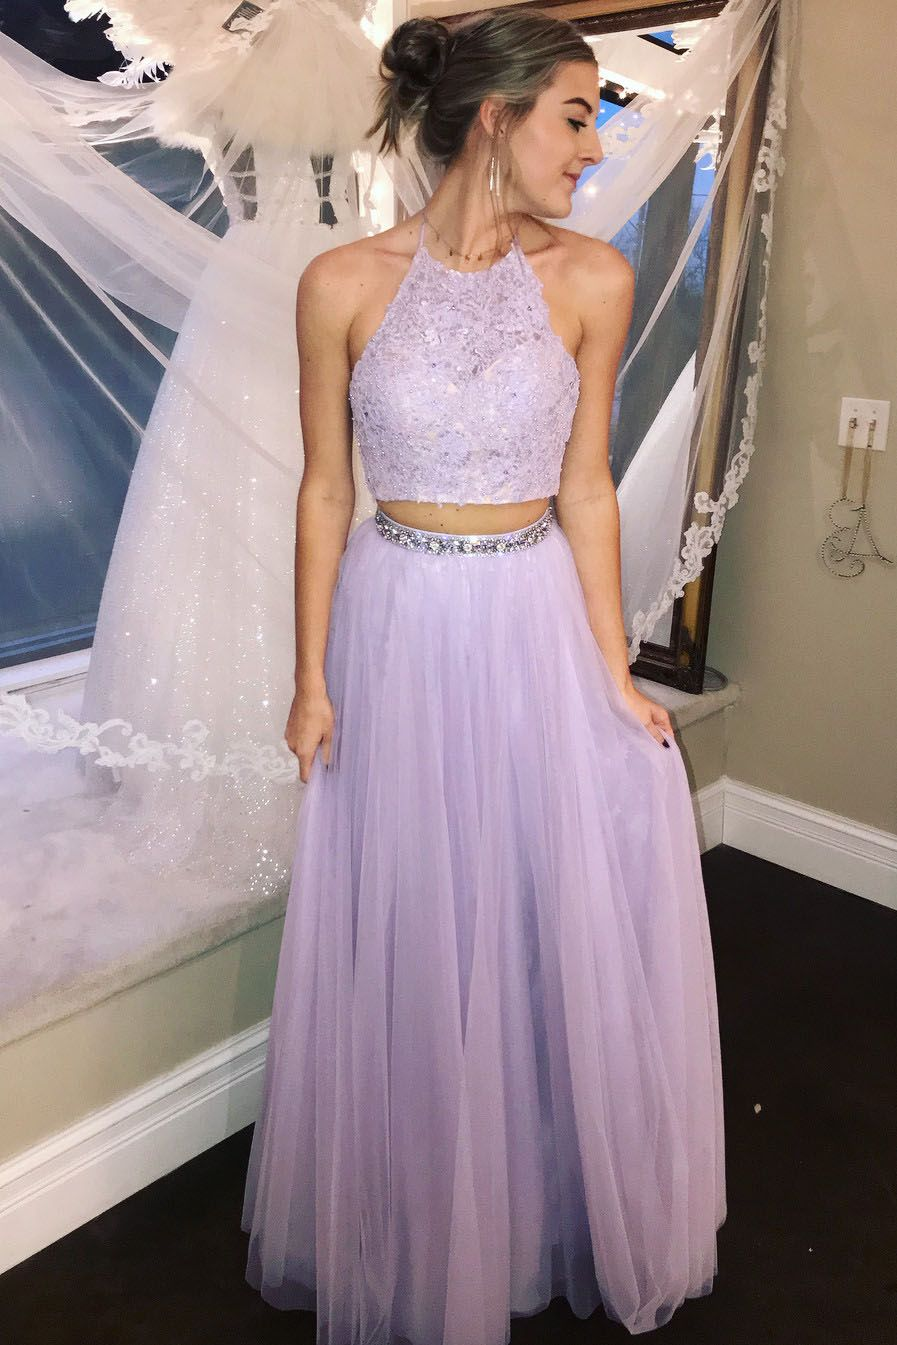 Two Pieces Prom Dress 2 Piece Prom Gown Elegant Prom Dresses Lavender Prom Dresses Halter Prom Dresses [ 1345 x 897 Pixel ]